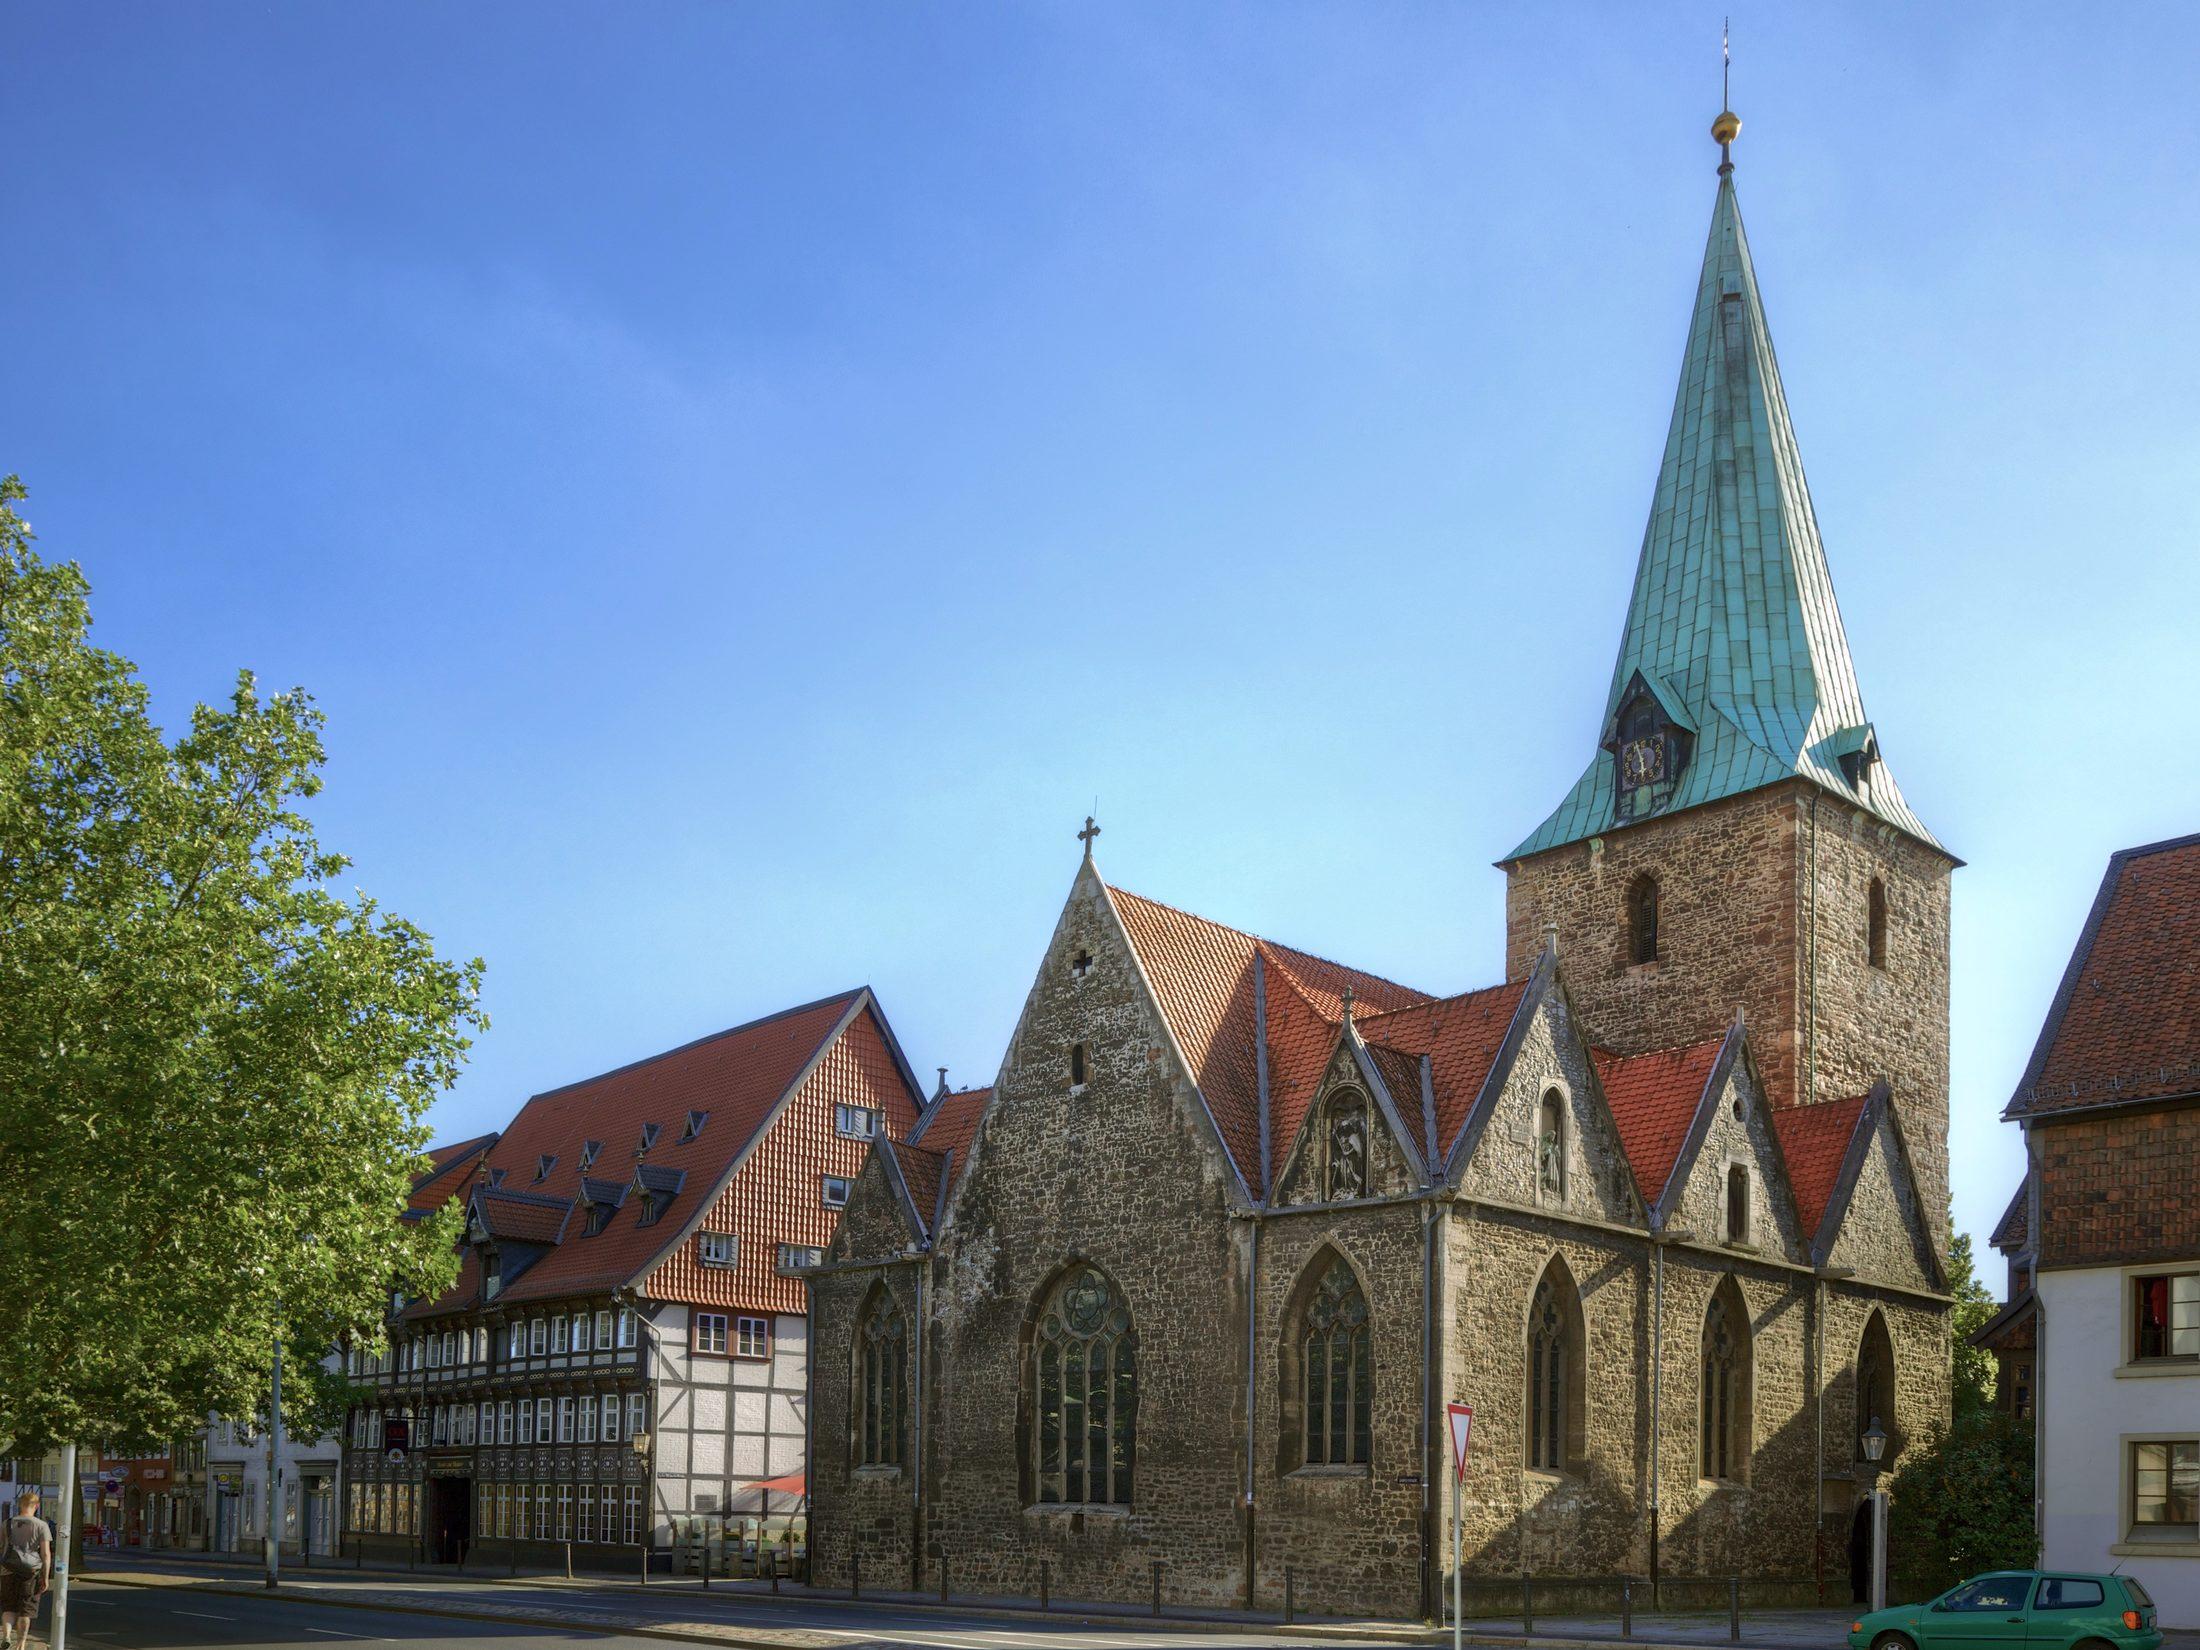 St-Michaelis